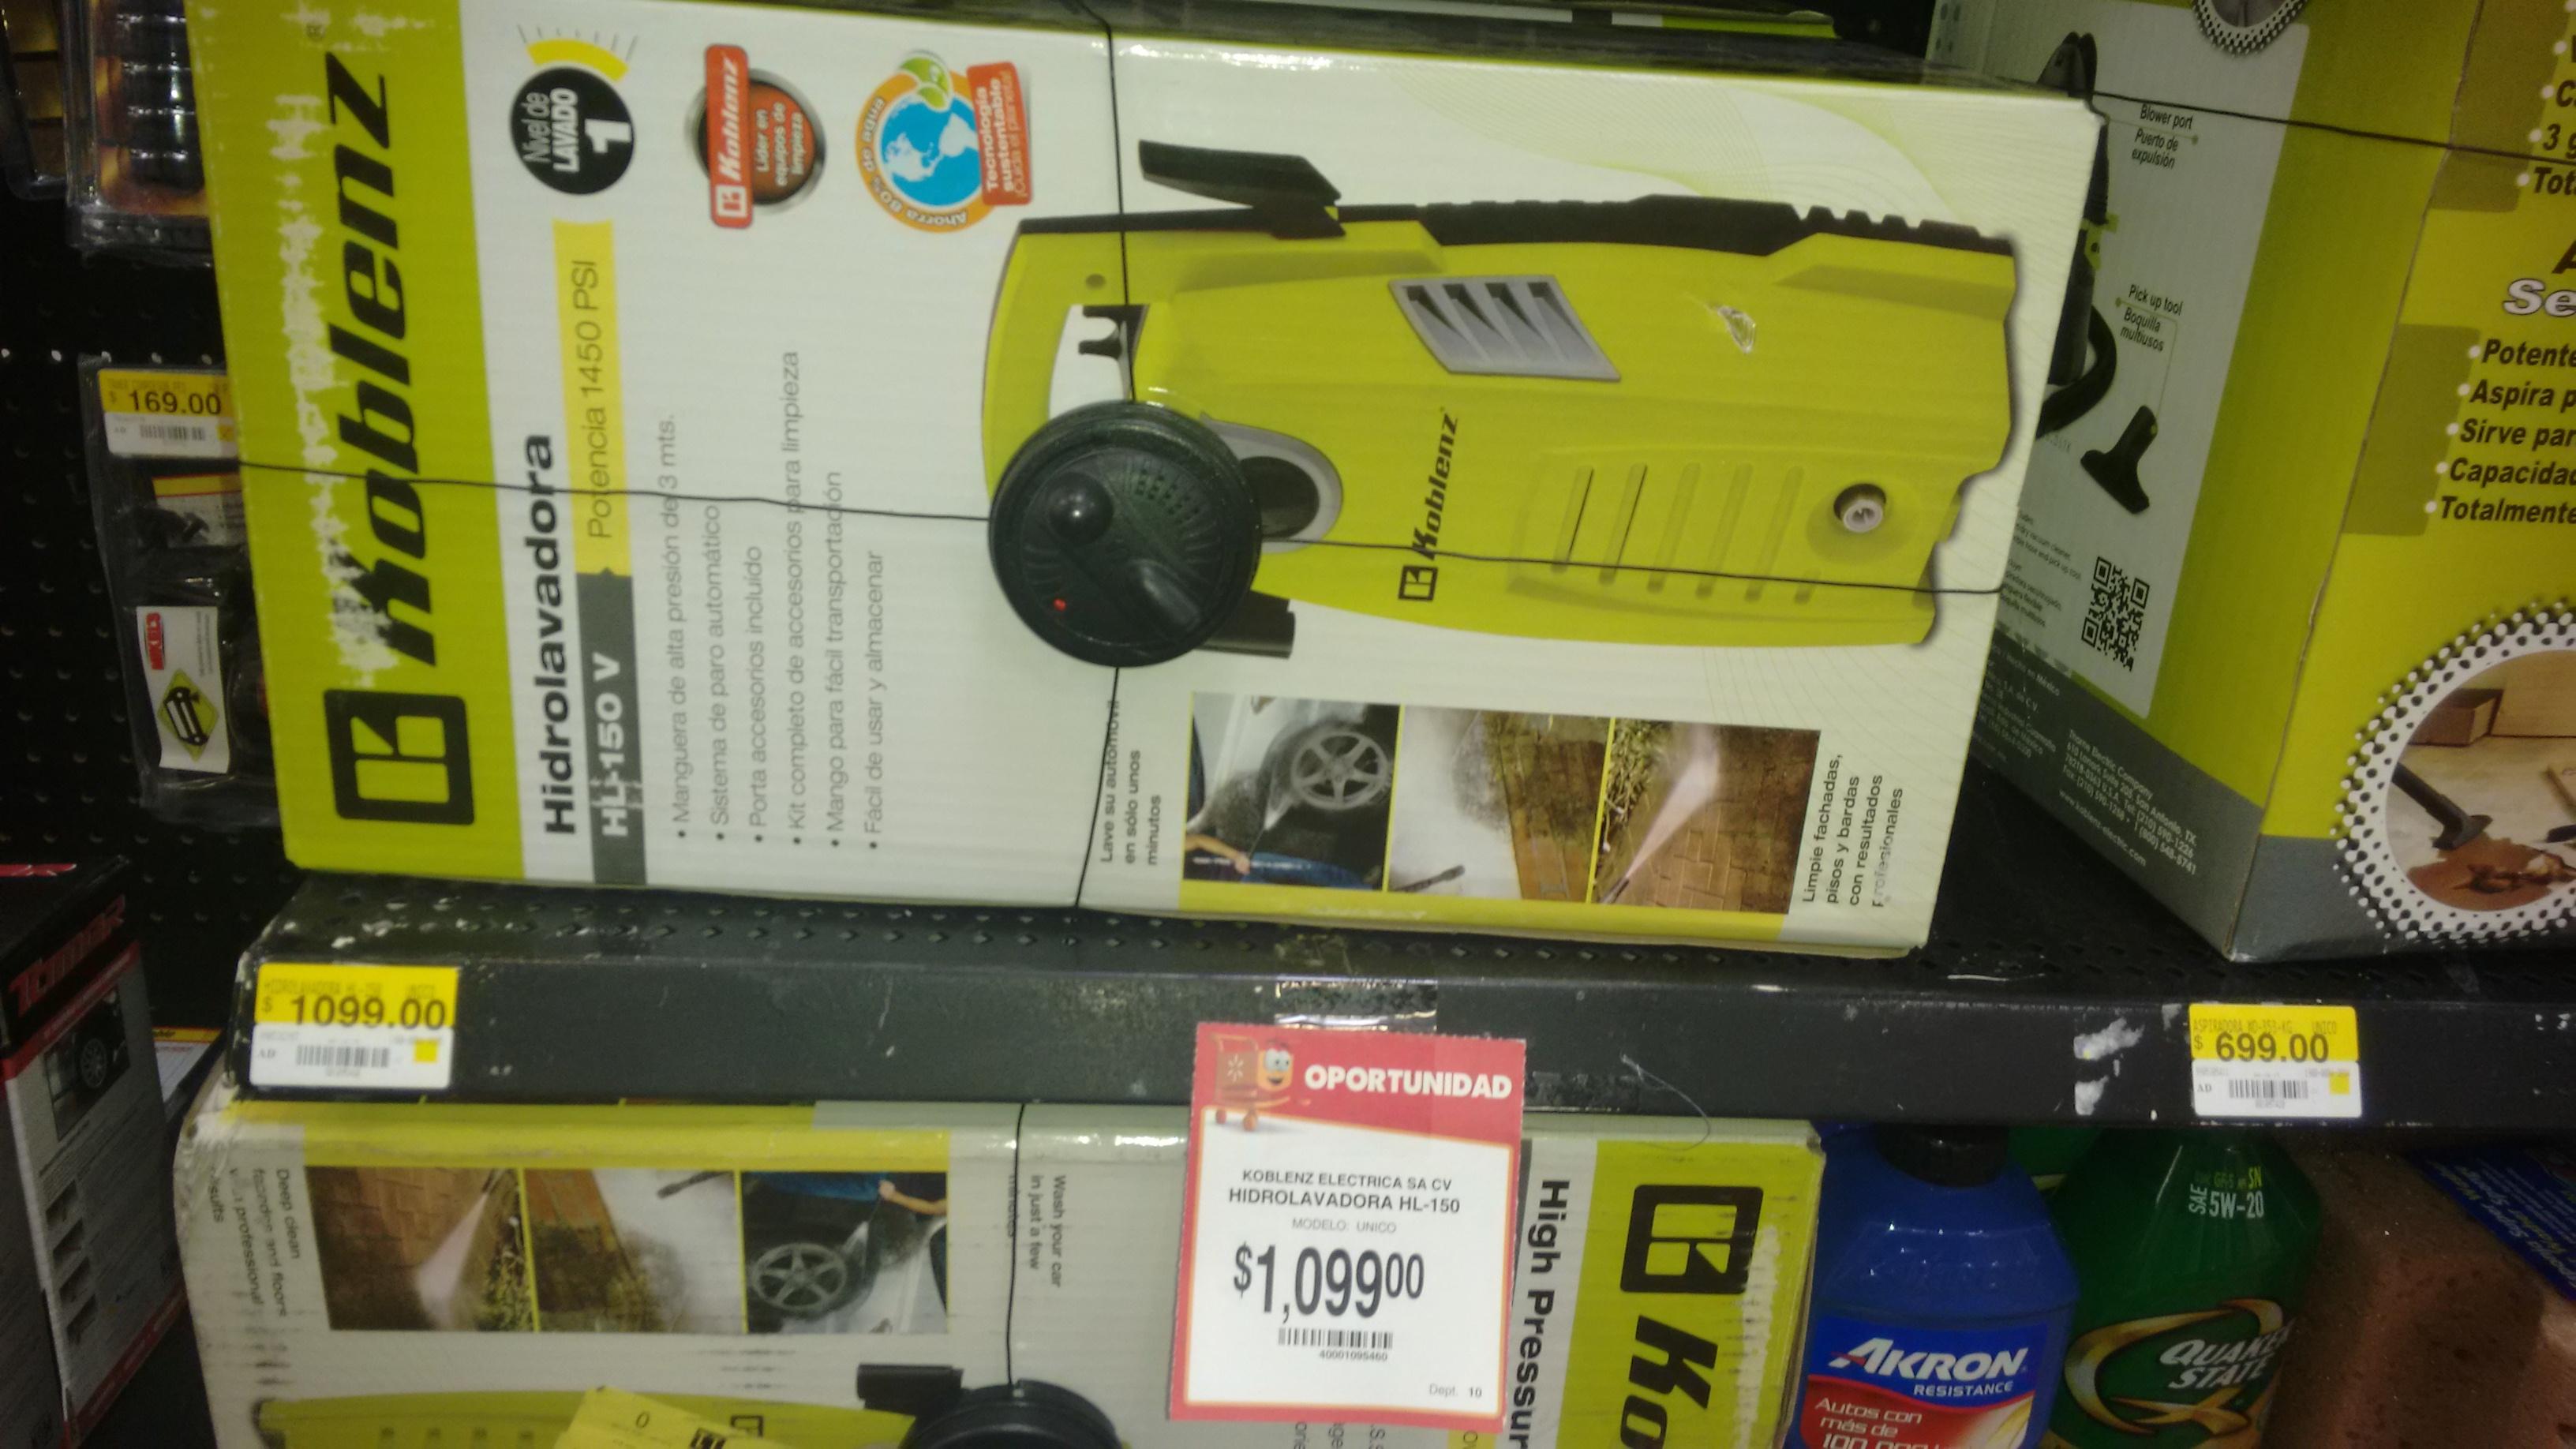 Walmart: hidrolavadora koblenz $1,099